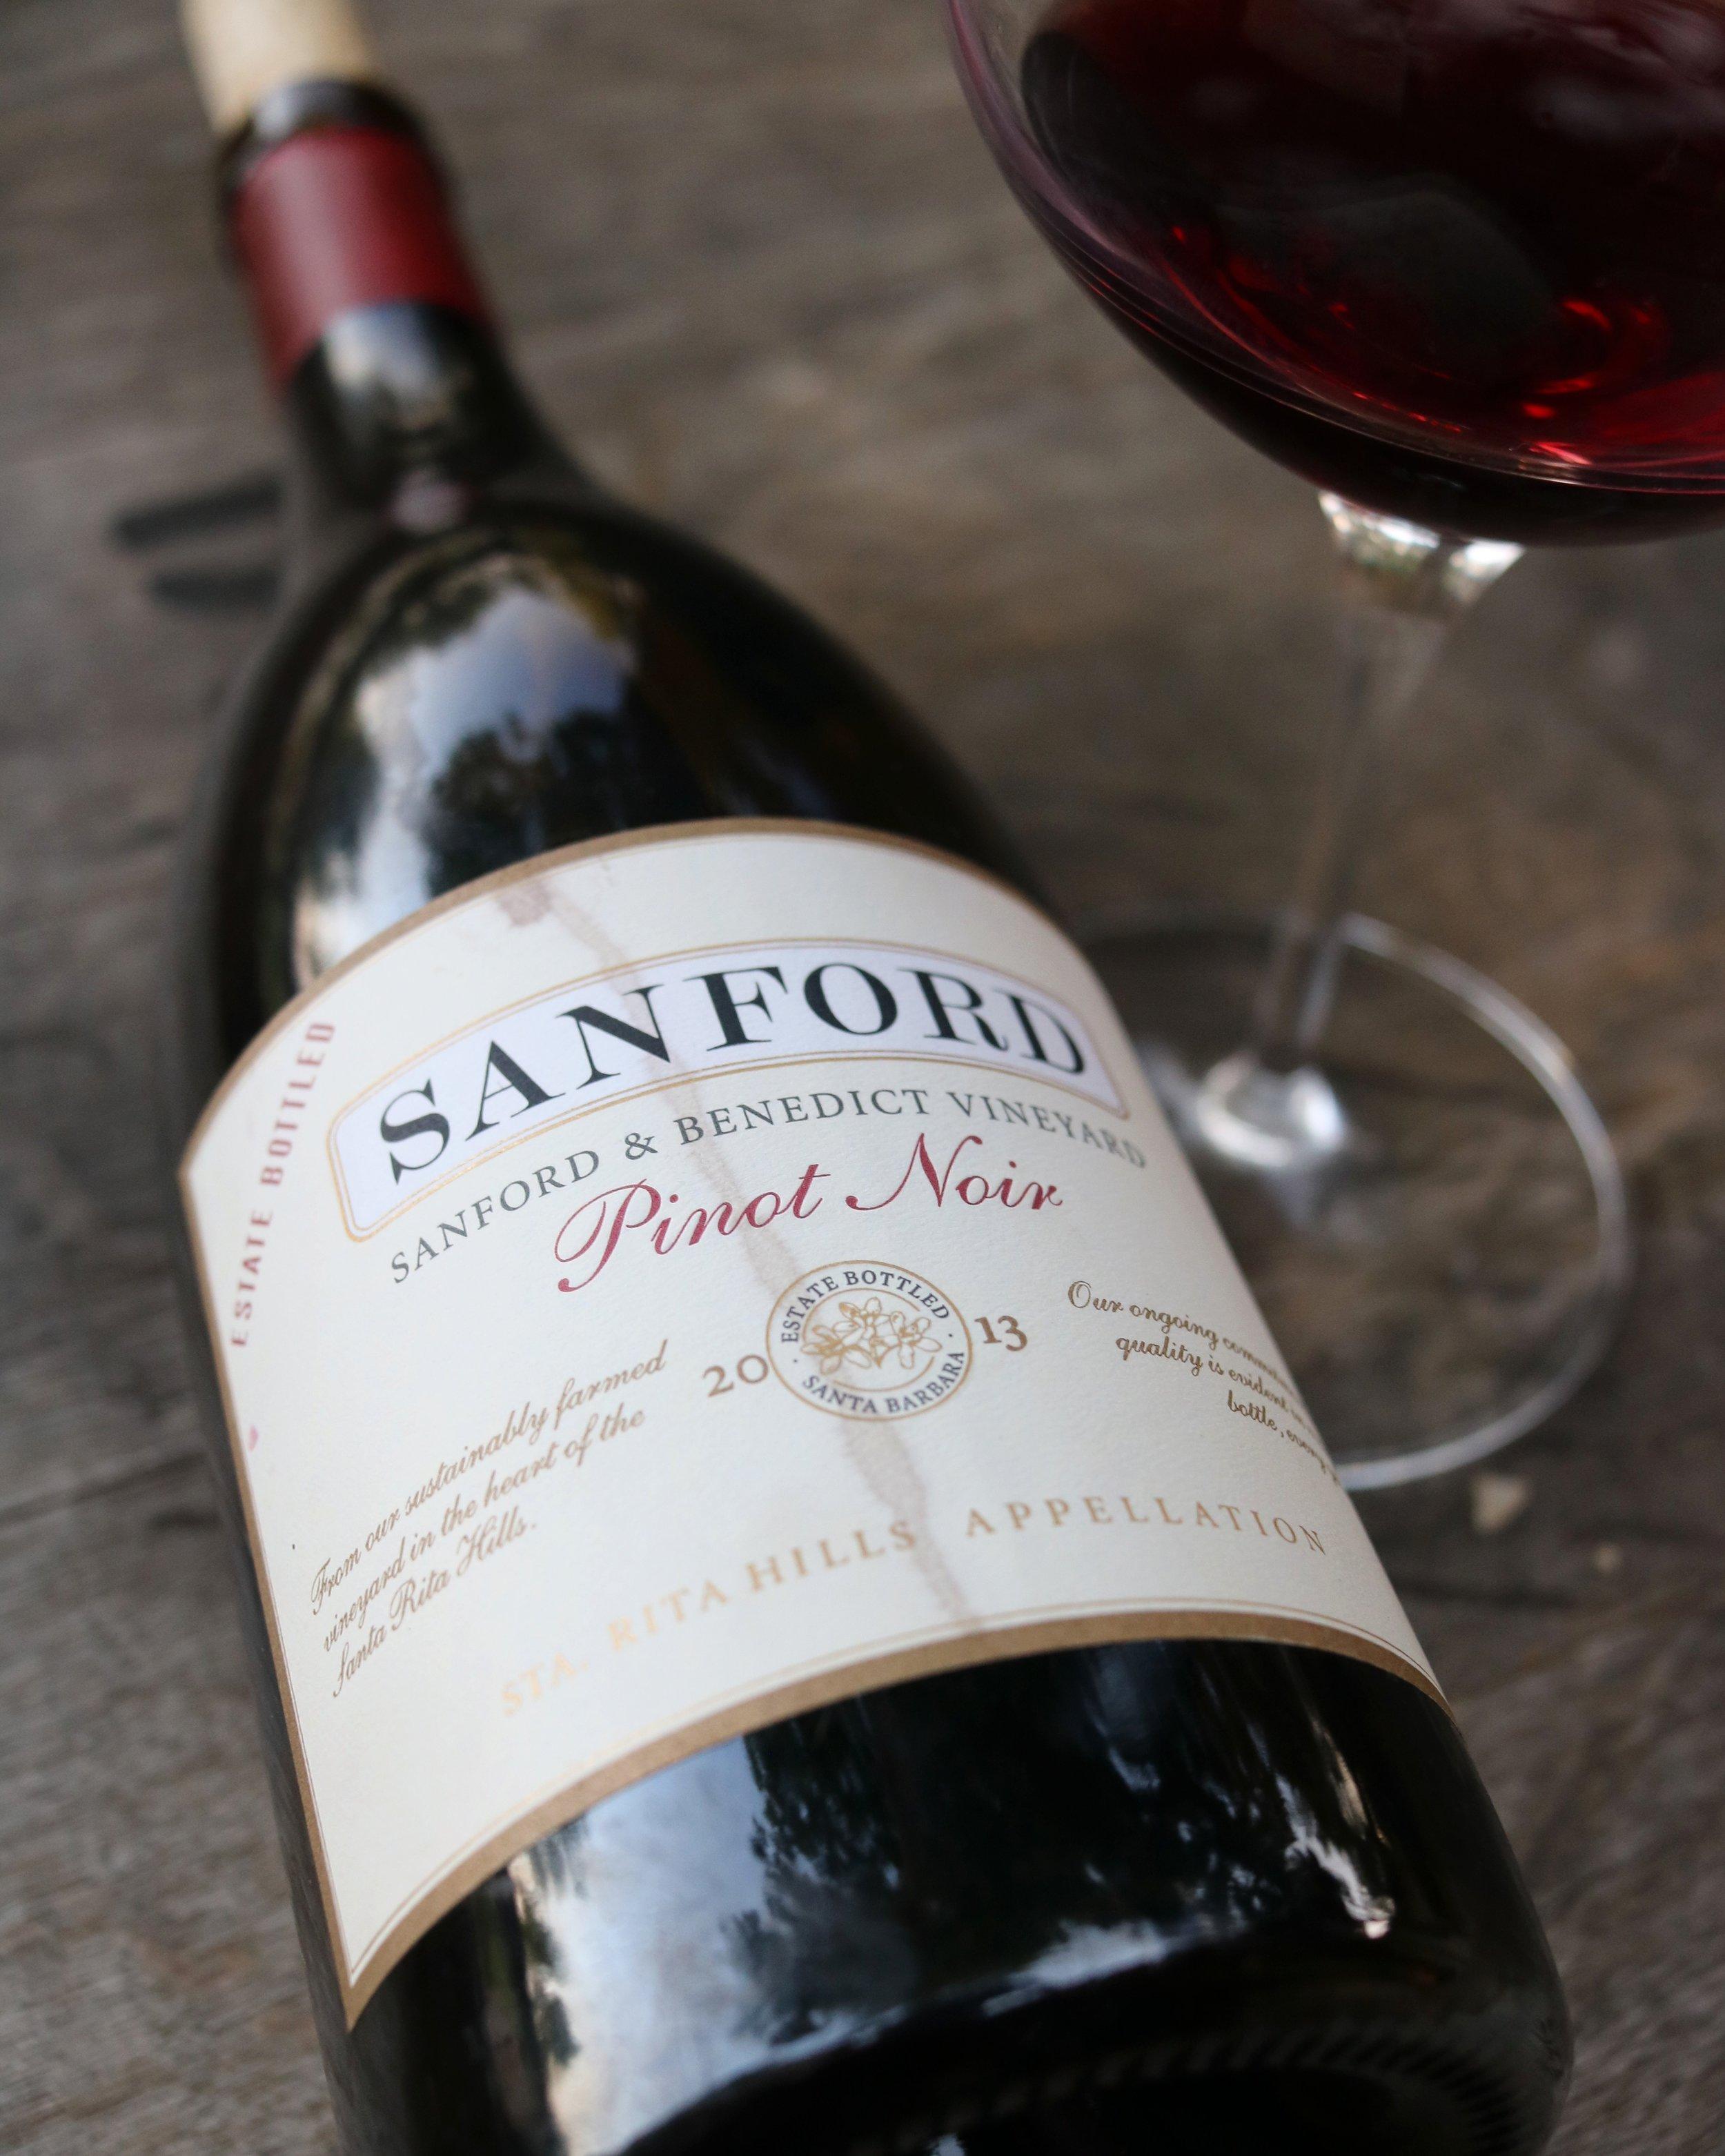 Sanford S&B Pinot Noir.jpg